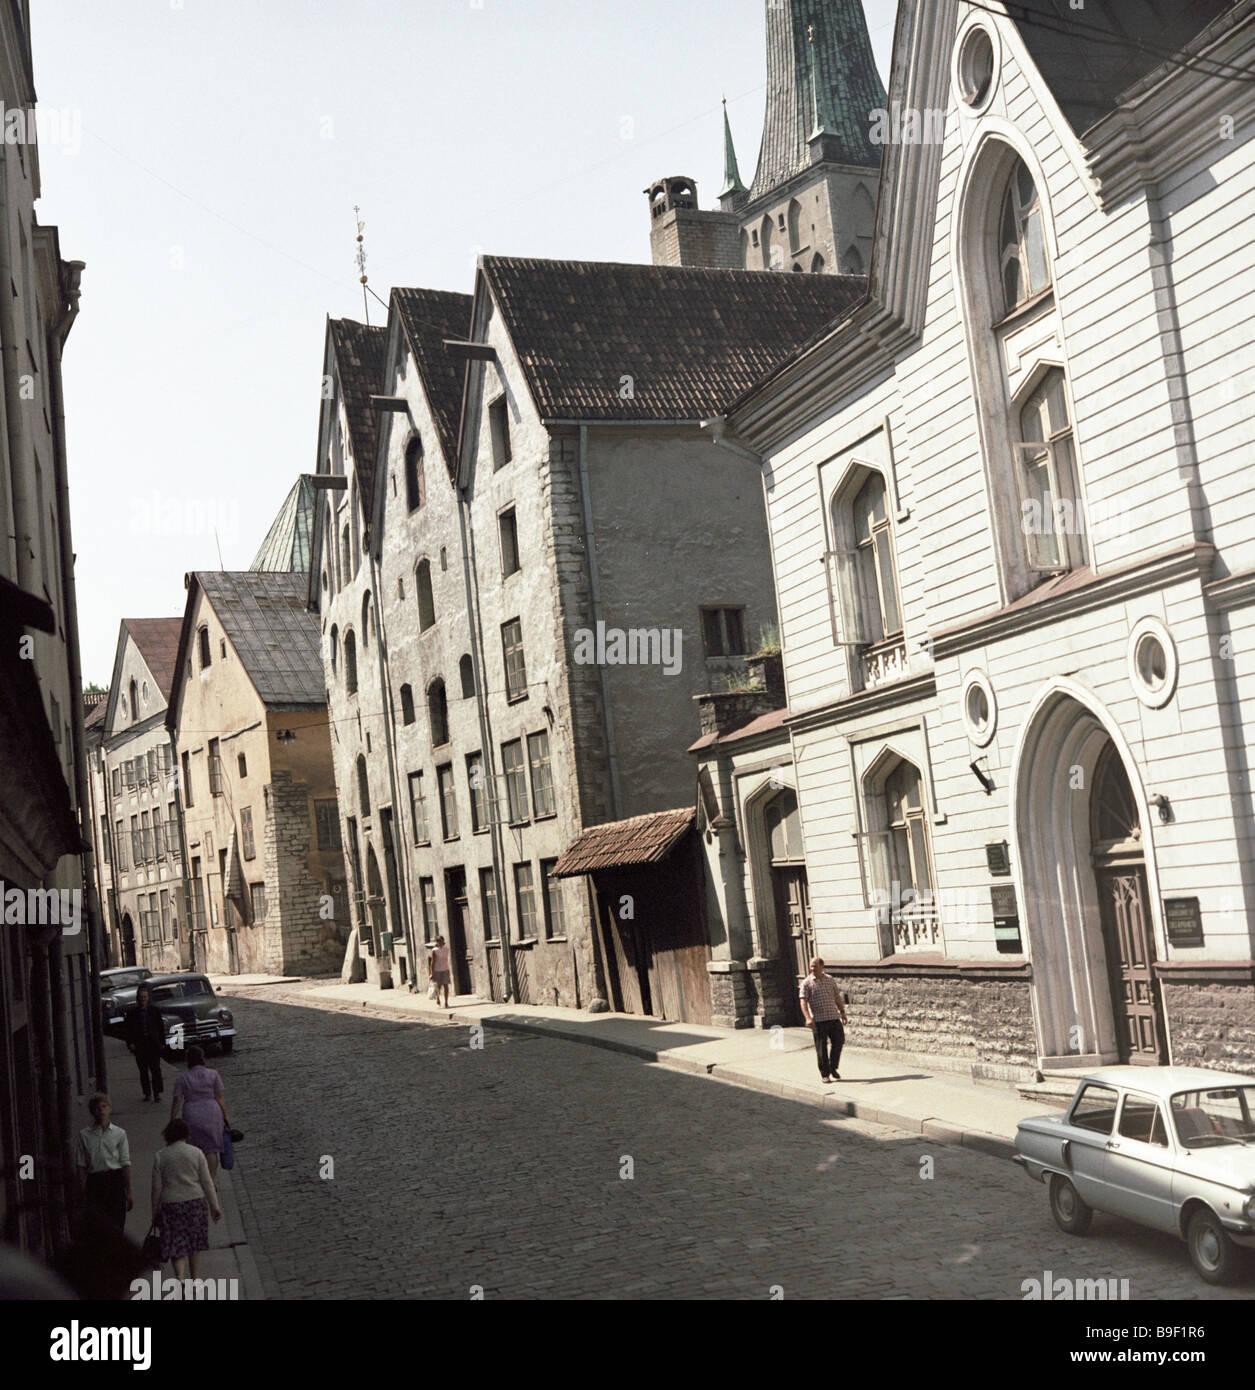 The Three Sisters buildings 15th century in Pikk Street Tallinn - Stock Image